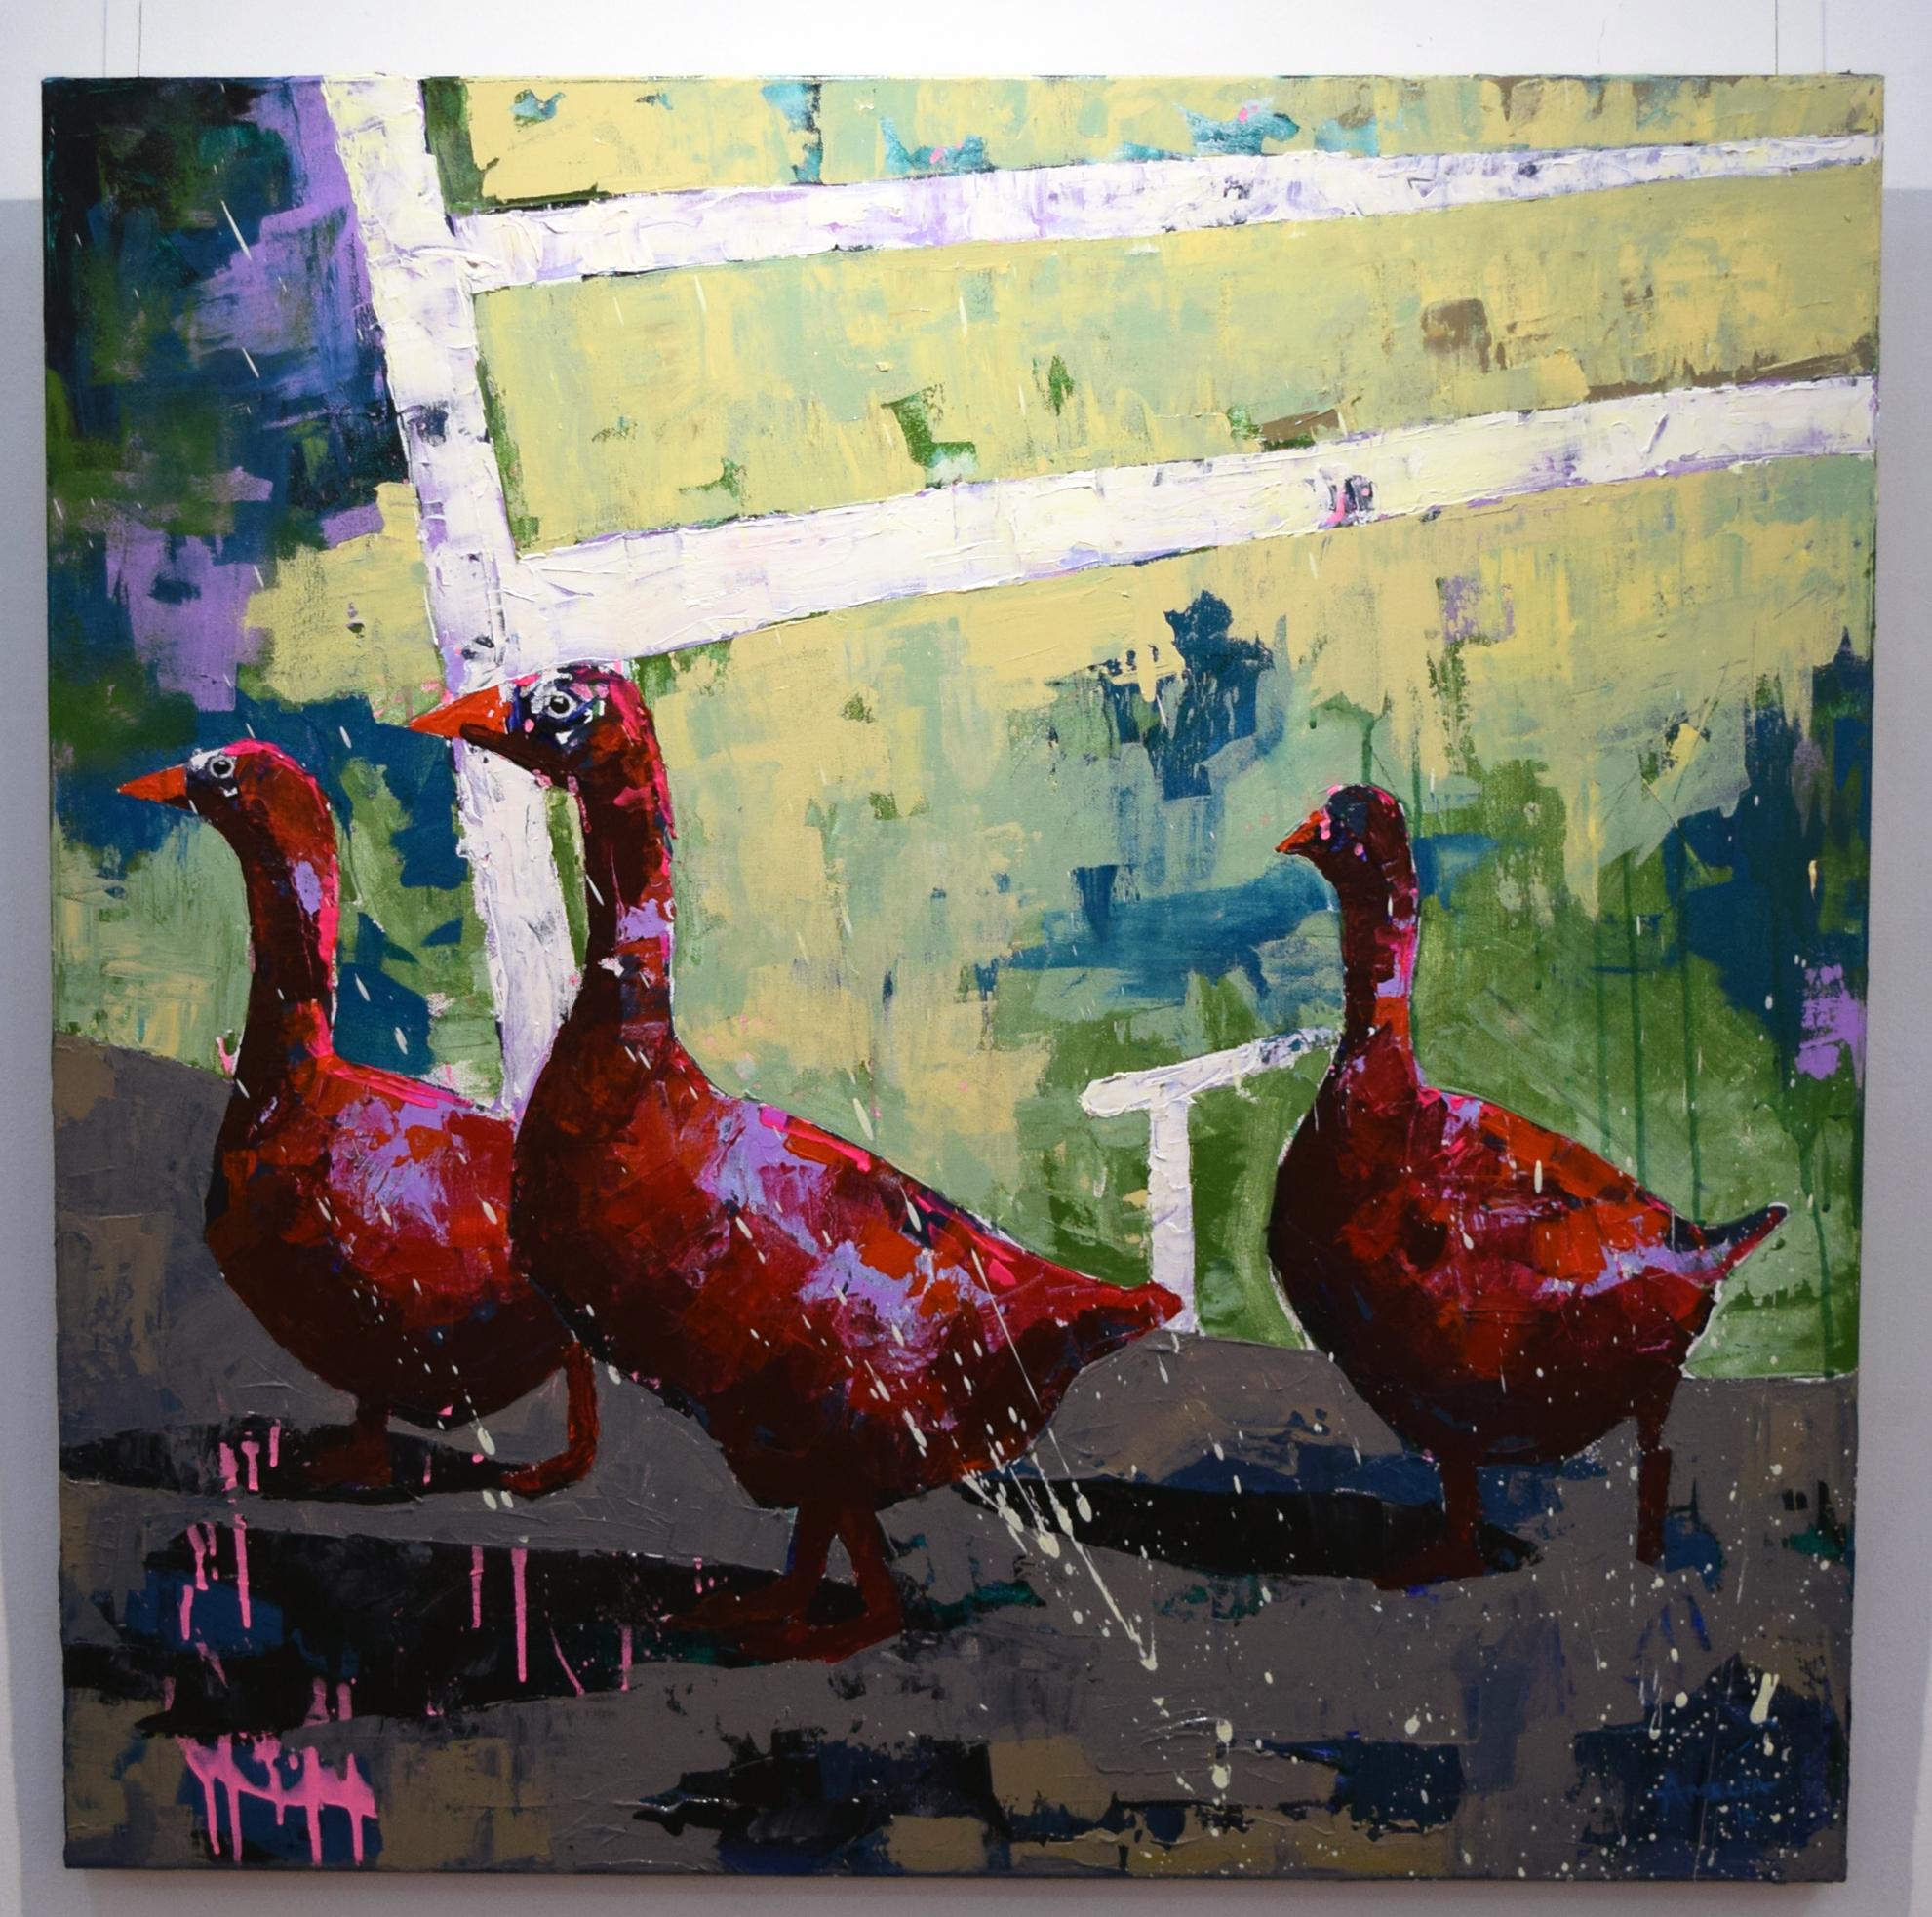 21. Amelia Sonnekus, Geese in the Farmyard, 2018, acrylic on canvas, 91 x 91 cm, $1,670